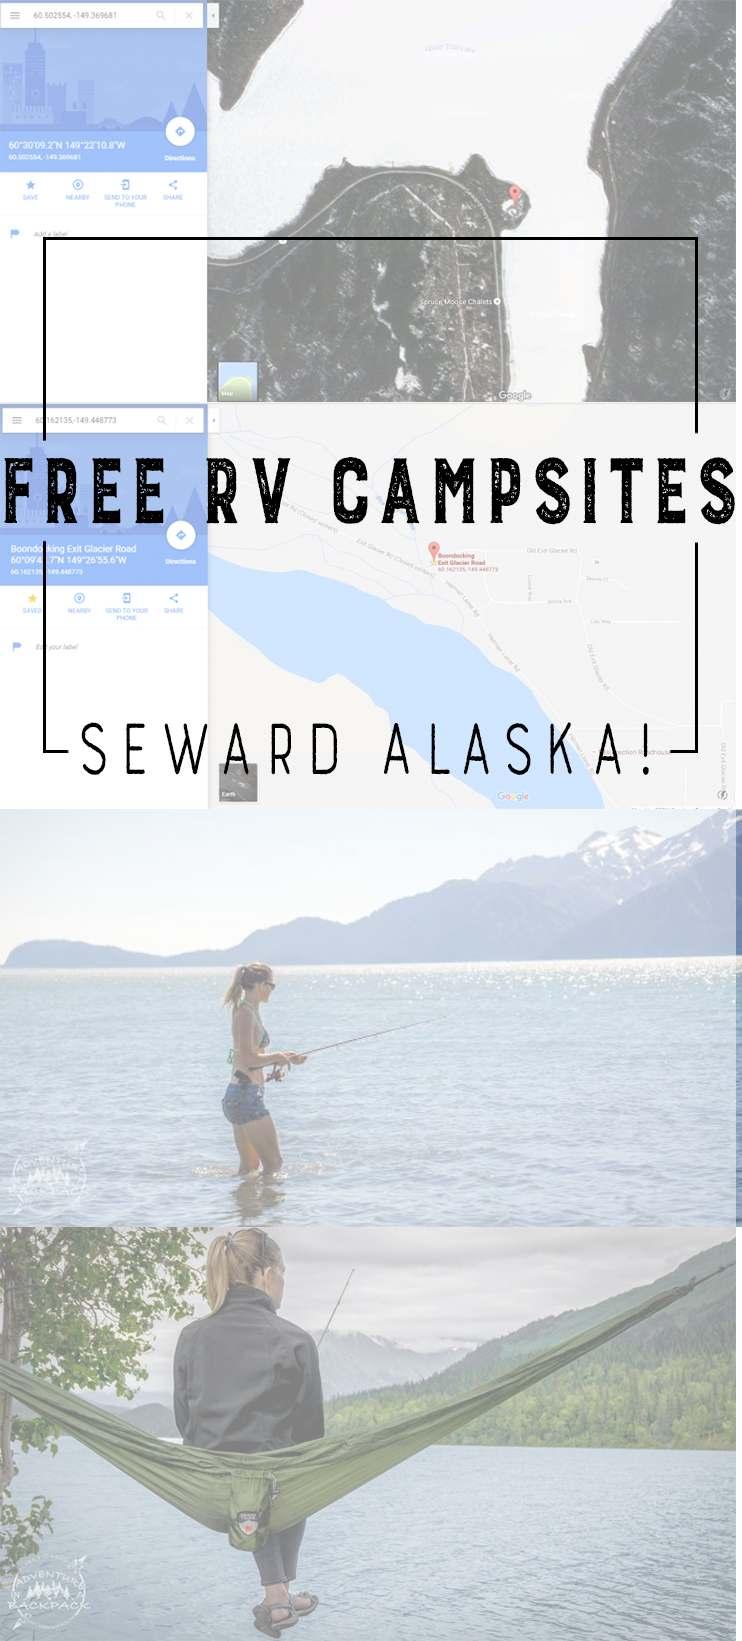 Boondocking in Seward Alaska | RV Boondocking | Free Campsites | Seward Alaska | Free places to camp in Alaska | Boondocking Campsites in Seward Alaska | #boondocking #freecamping #campingalaska